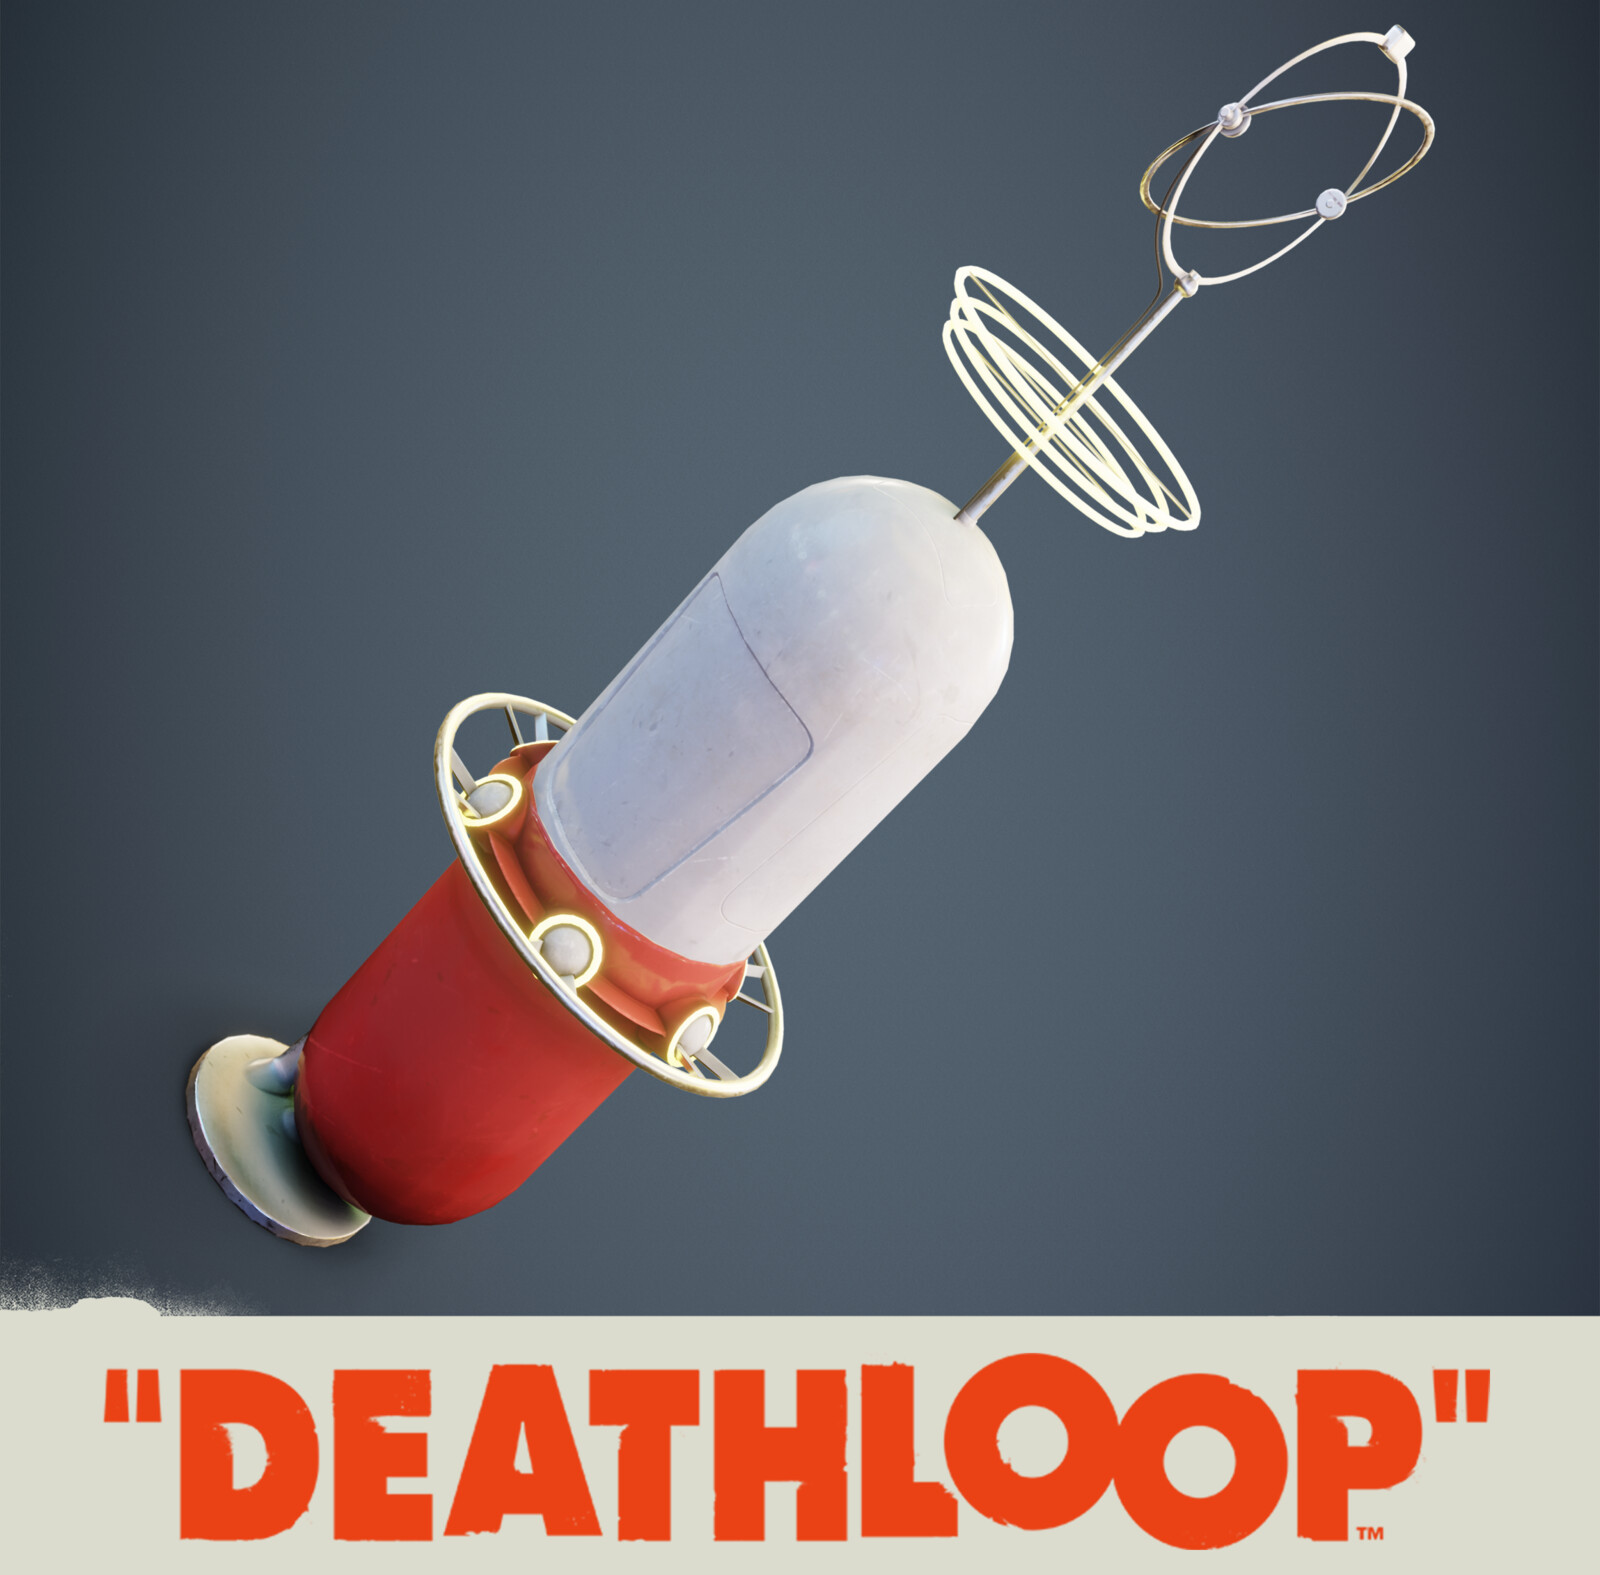 Health Station: Deathloop Prop